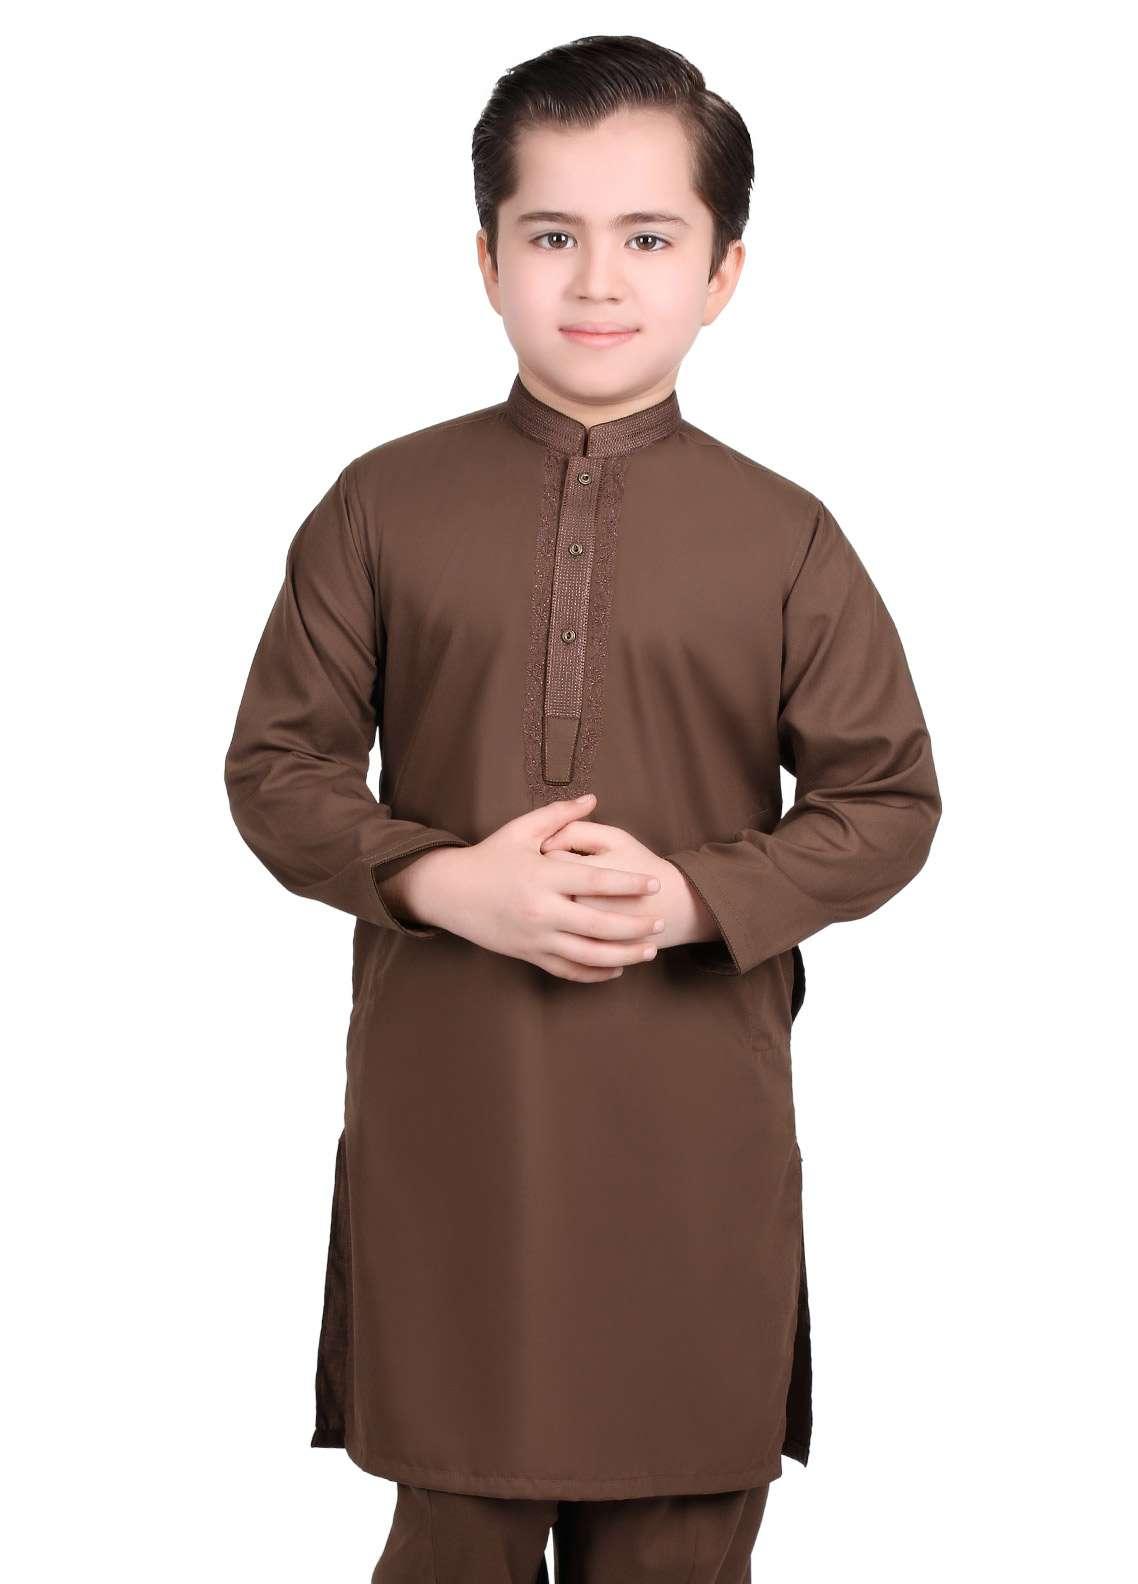 Edenrobe Cotton Embroidered Boys Kameez Shalwar - Brown EDS18B 3534